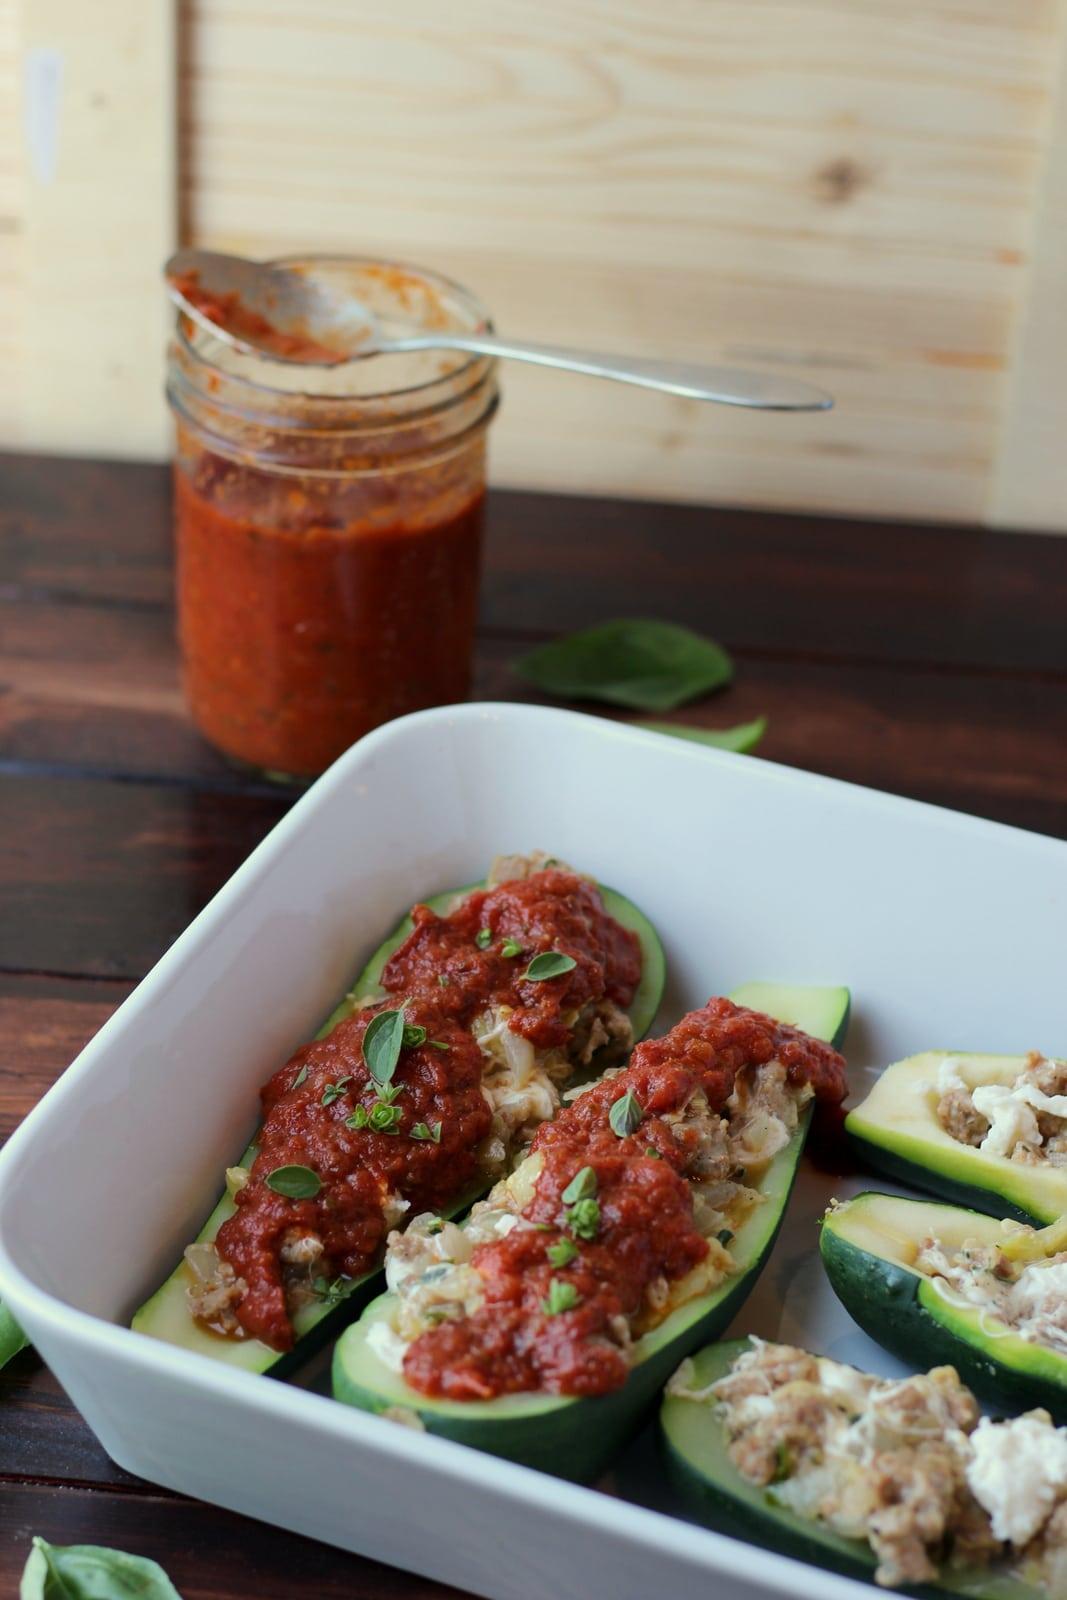 Stuffed Zucchini - thewoodenskillet.com #zucchini #sausage #dinner